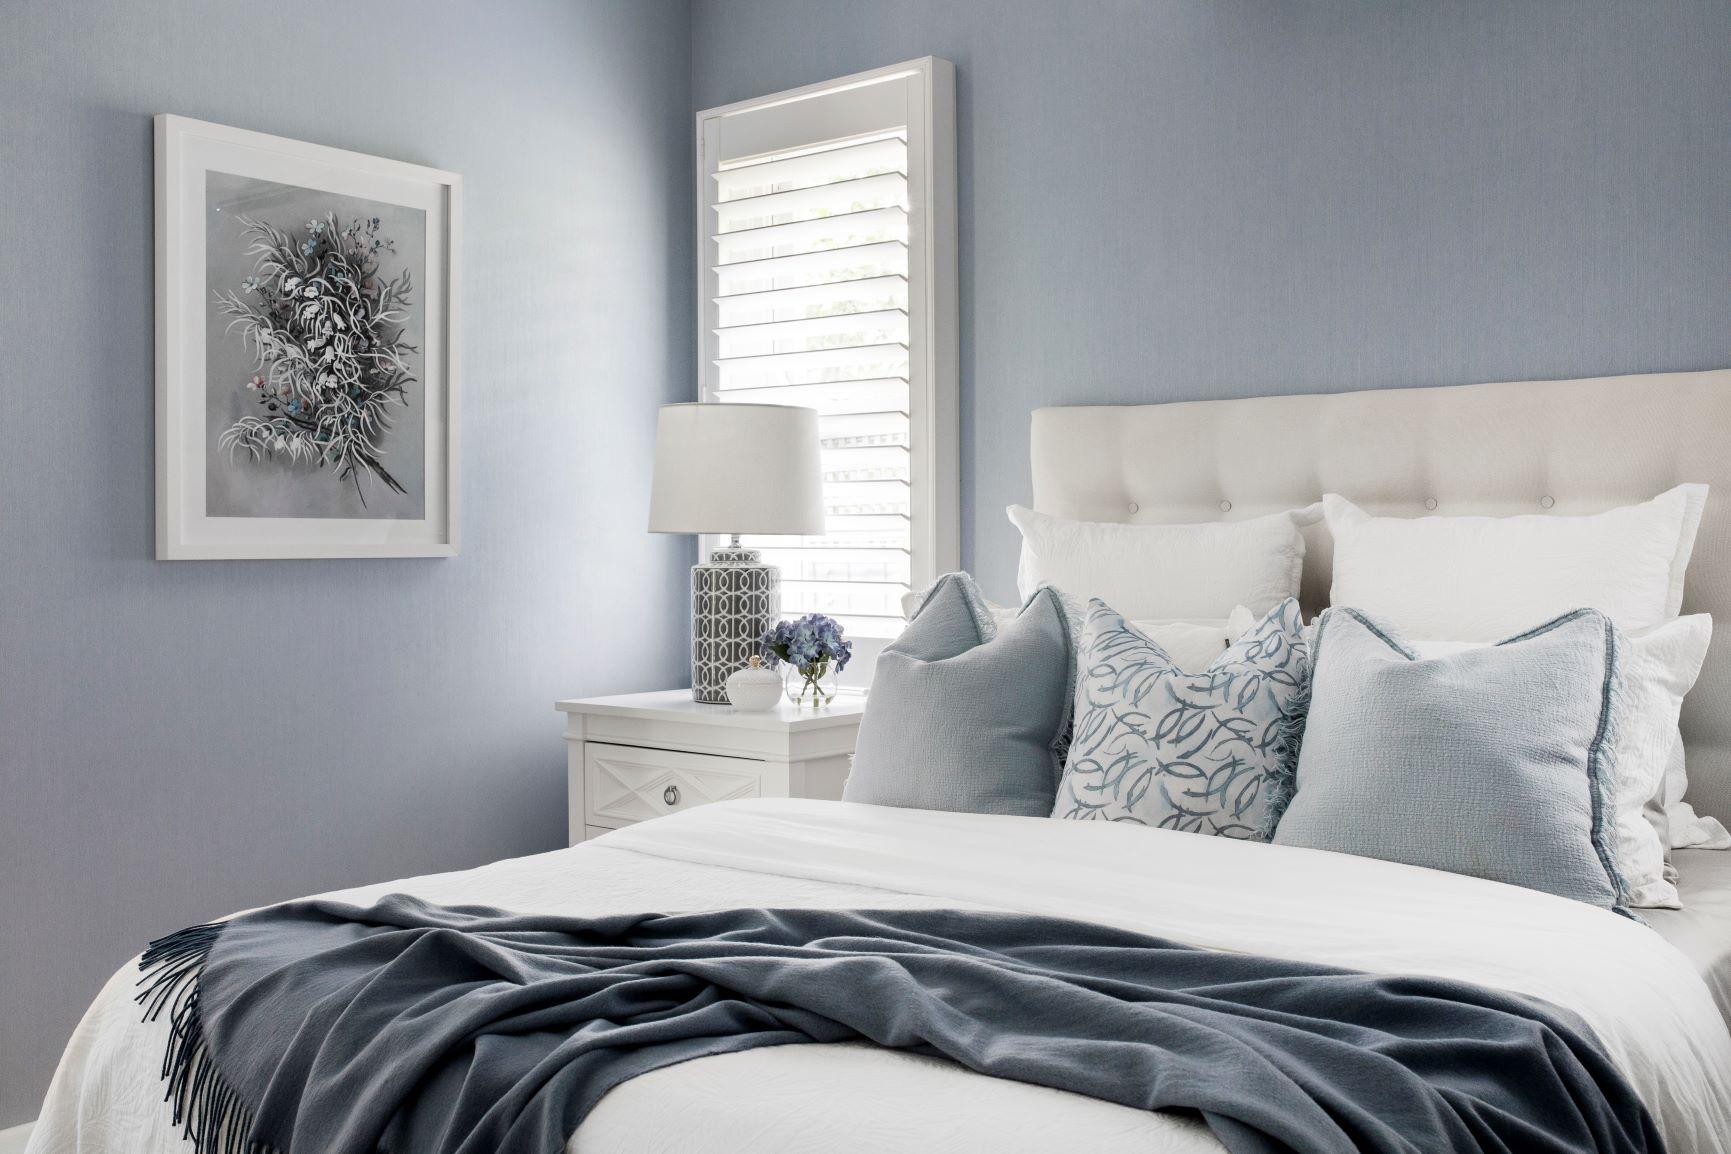 chris-carroll-tlc-interiors-bedroom-styling